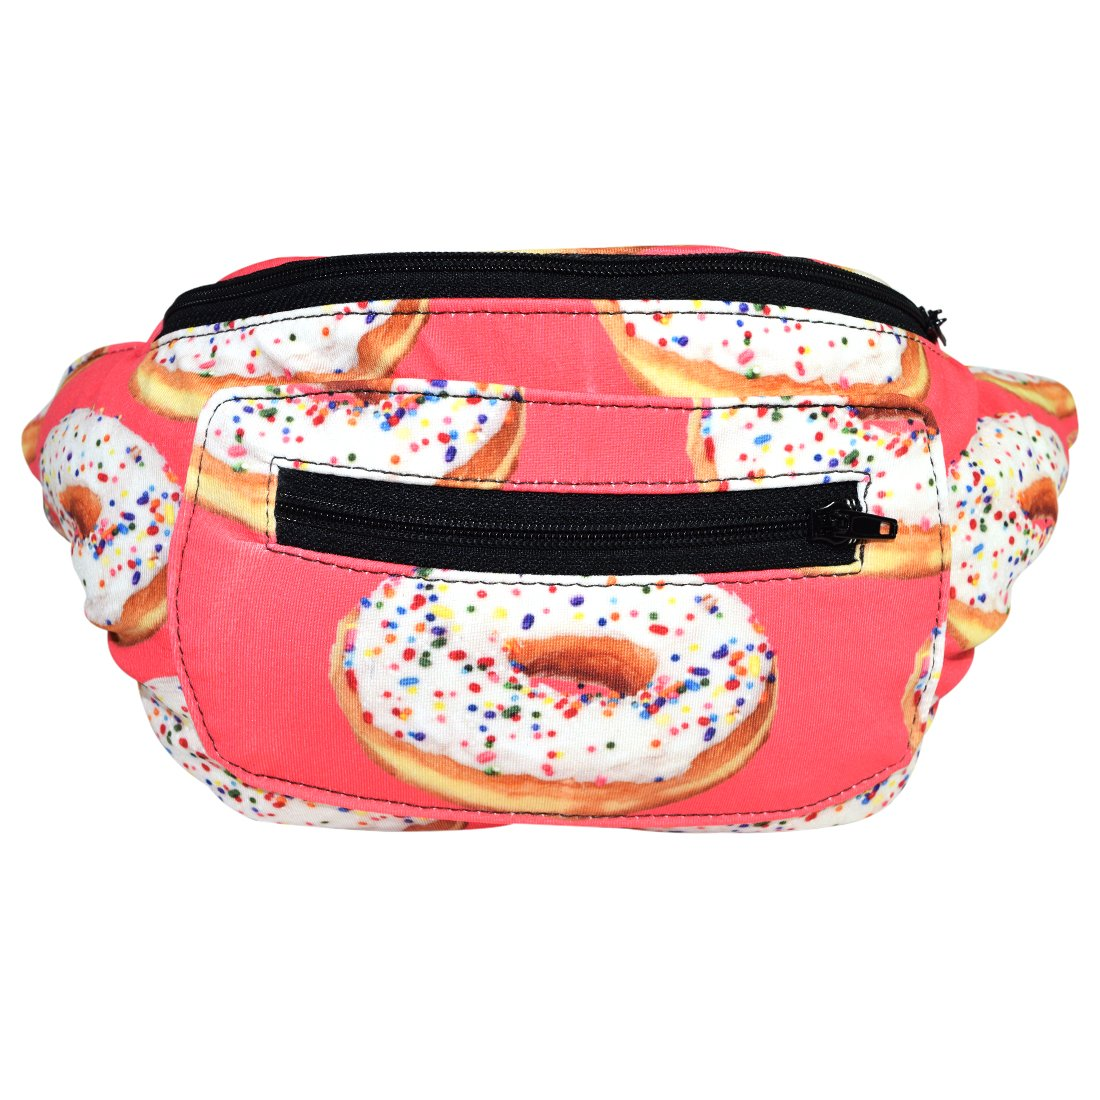 Sweetness is My Weakness Fanny Pack, Boho Chic Handmade Hip Hugger w/Hidden Pocket (Pink Sprinkles)